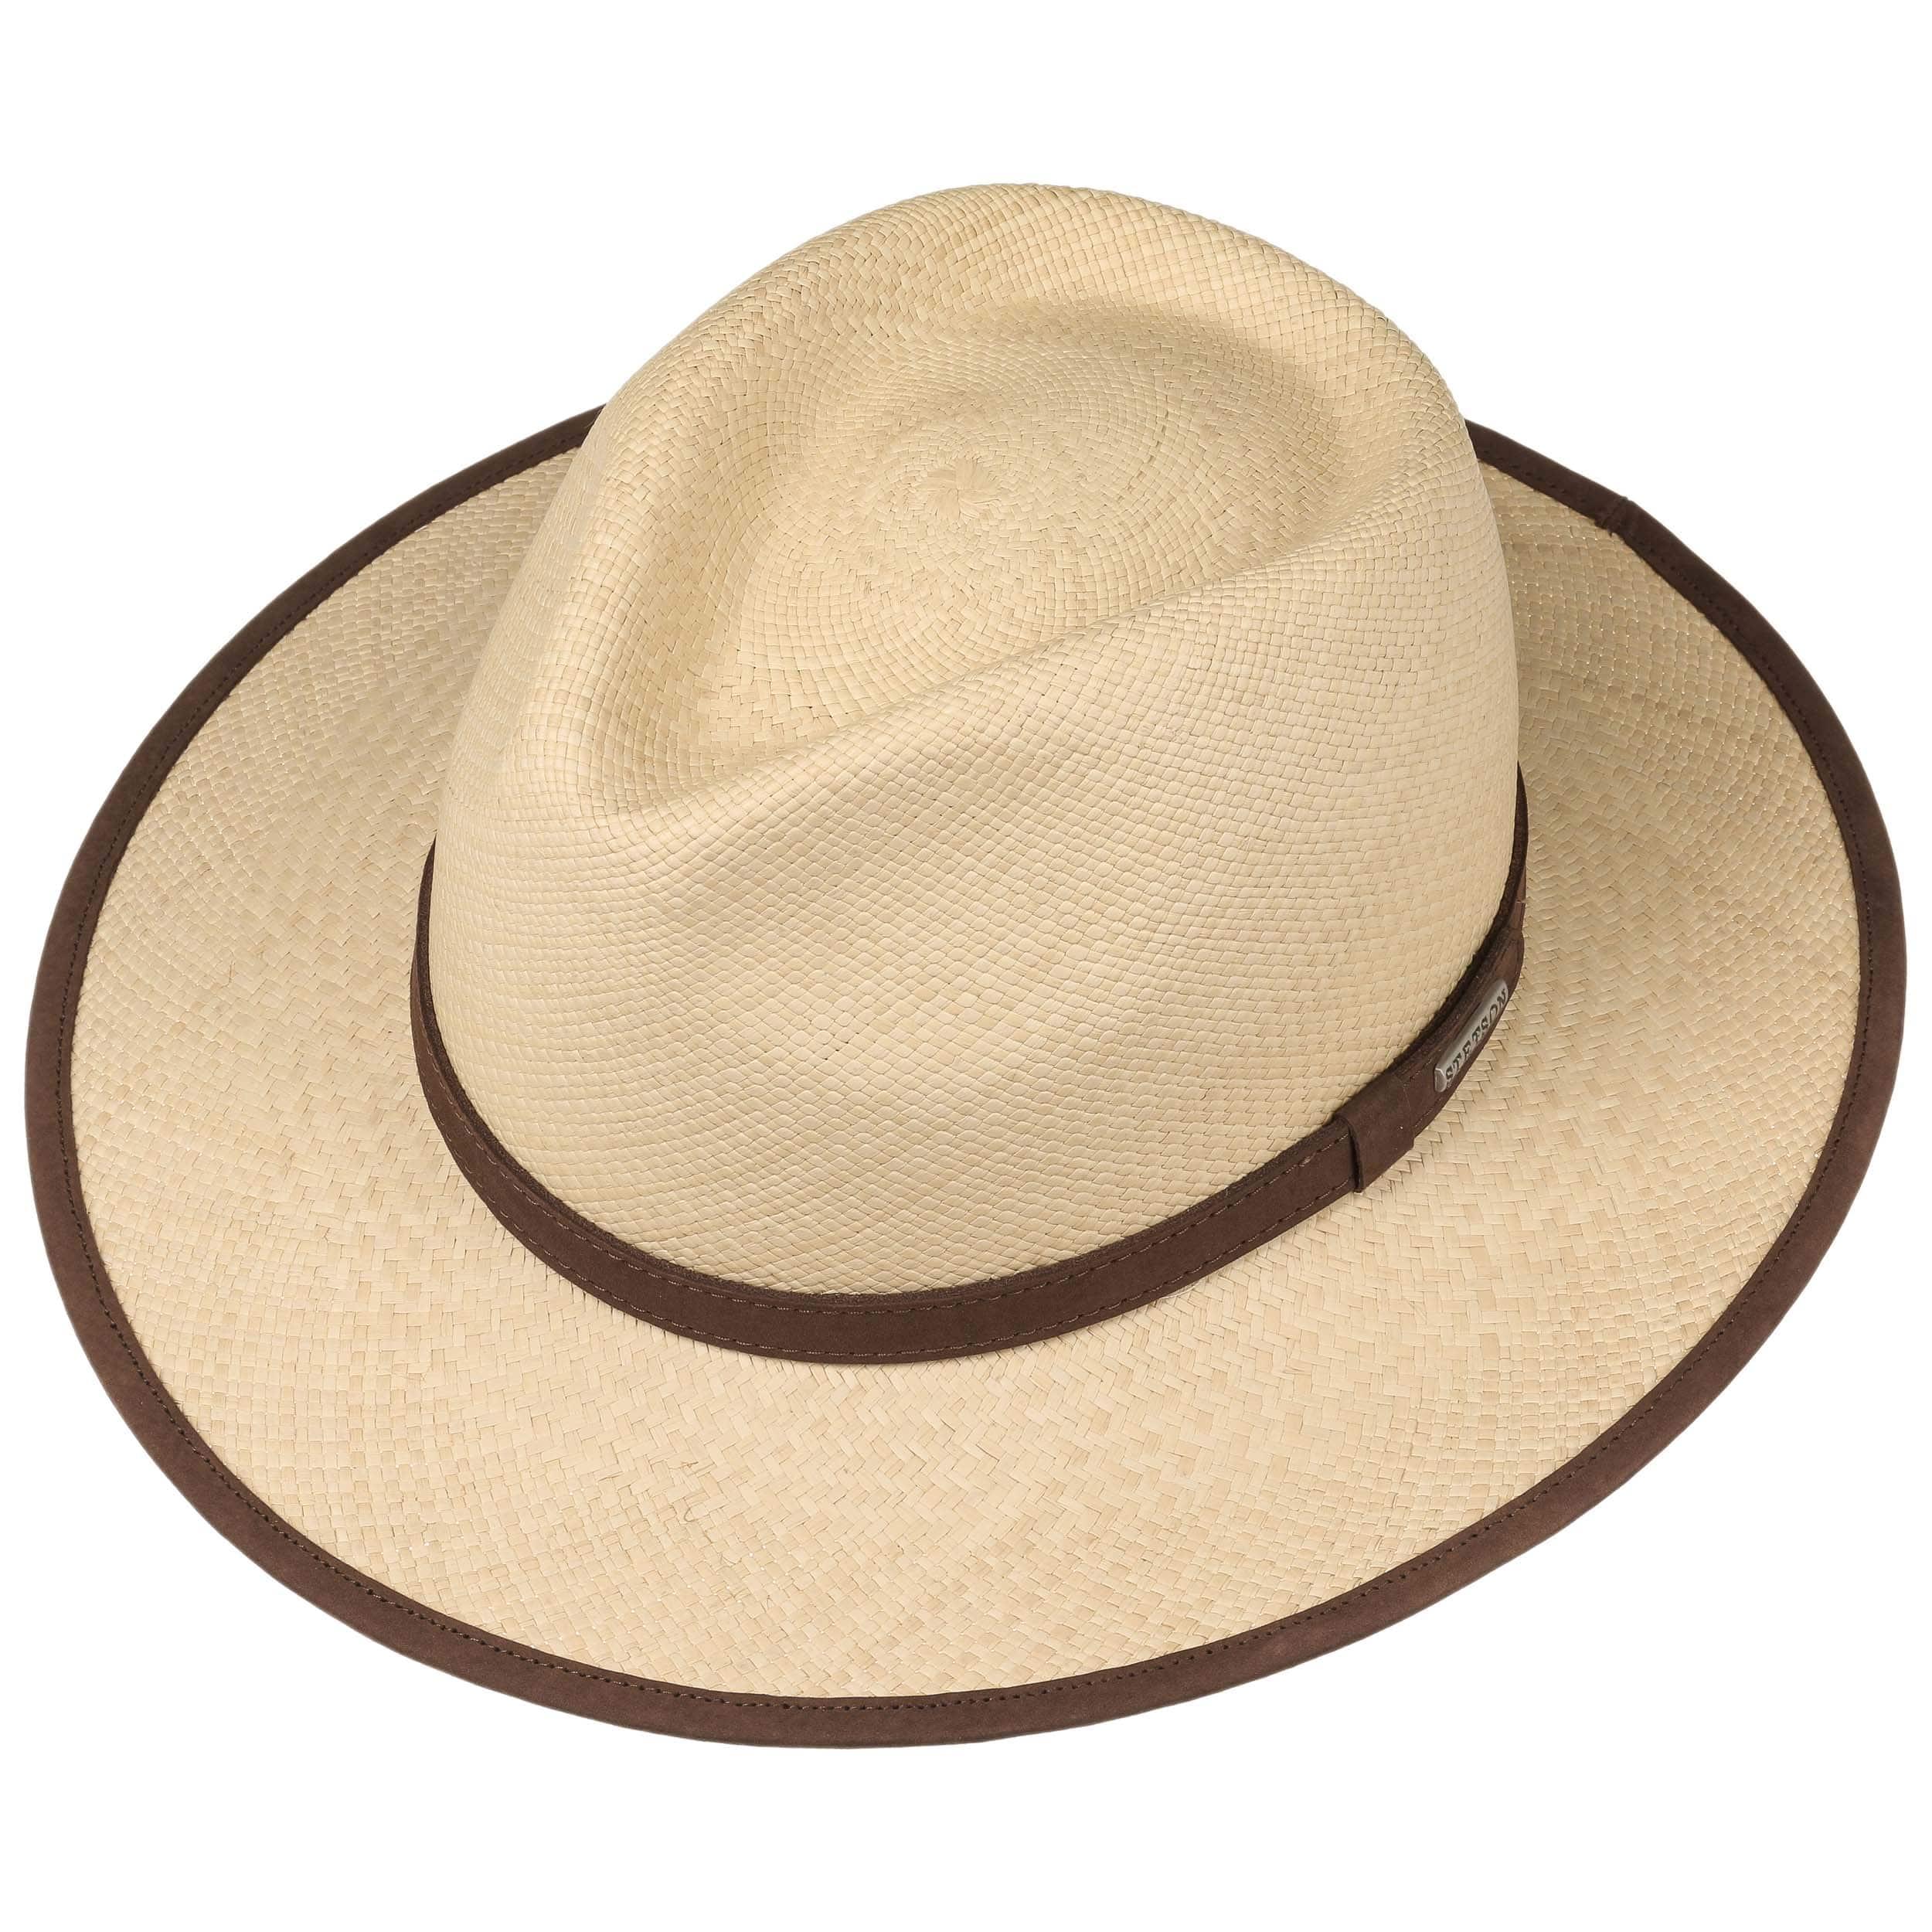 Panama Braid 1 Traveller Hat by Stetson Sun hats Stetson AVCkHbb